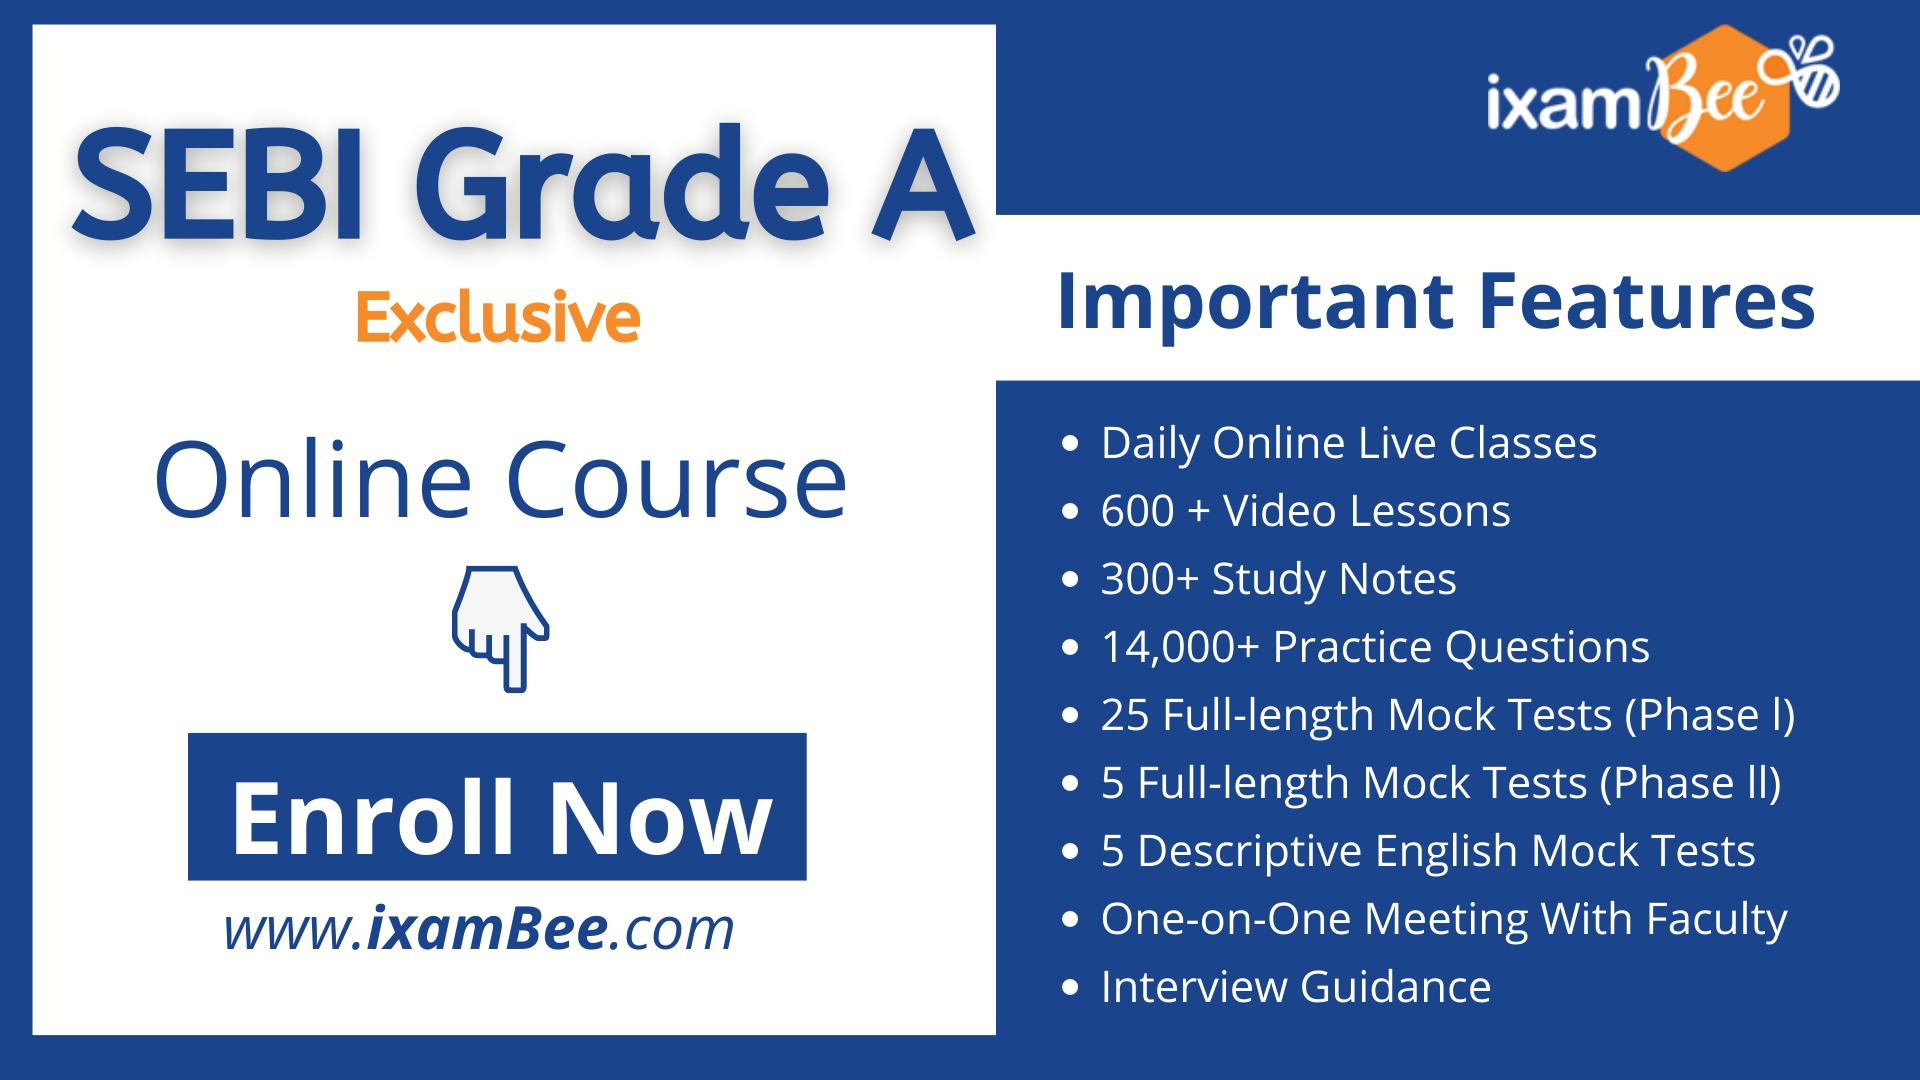 SEBI Grade A Exclusive Online Course